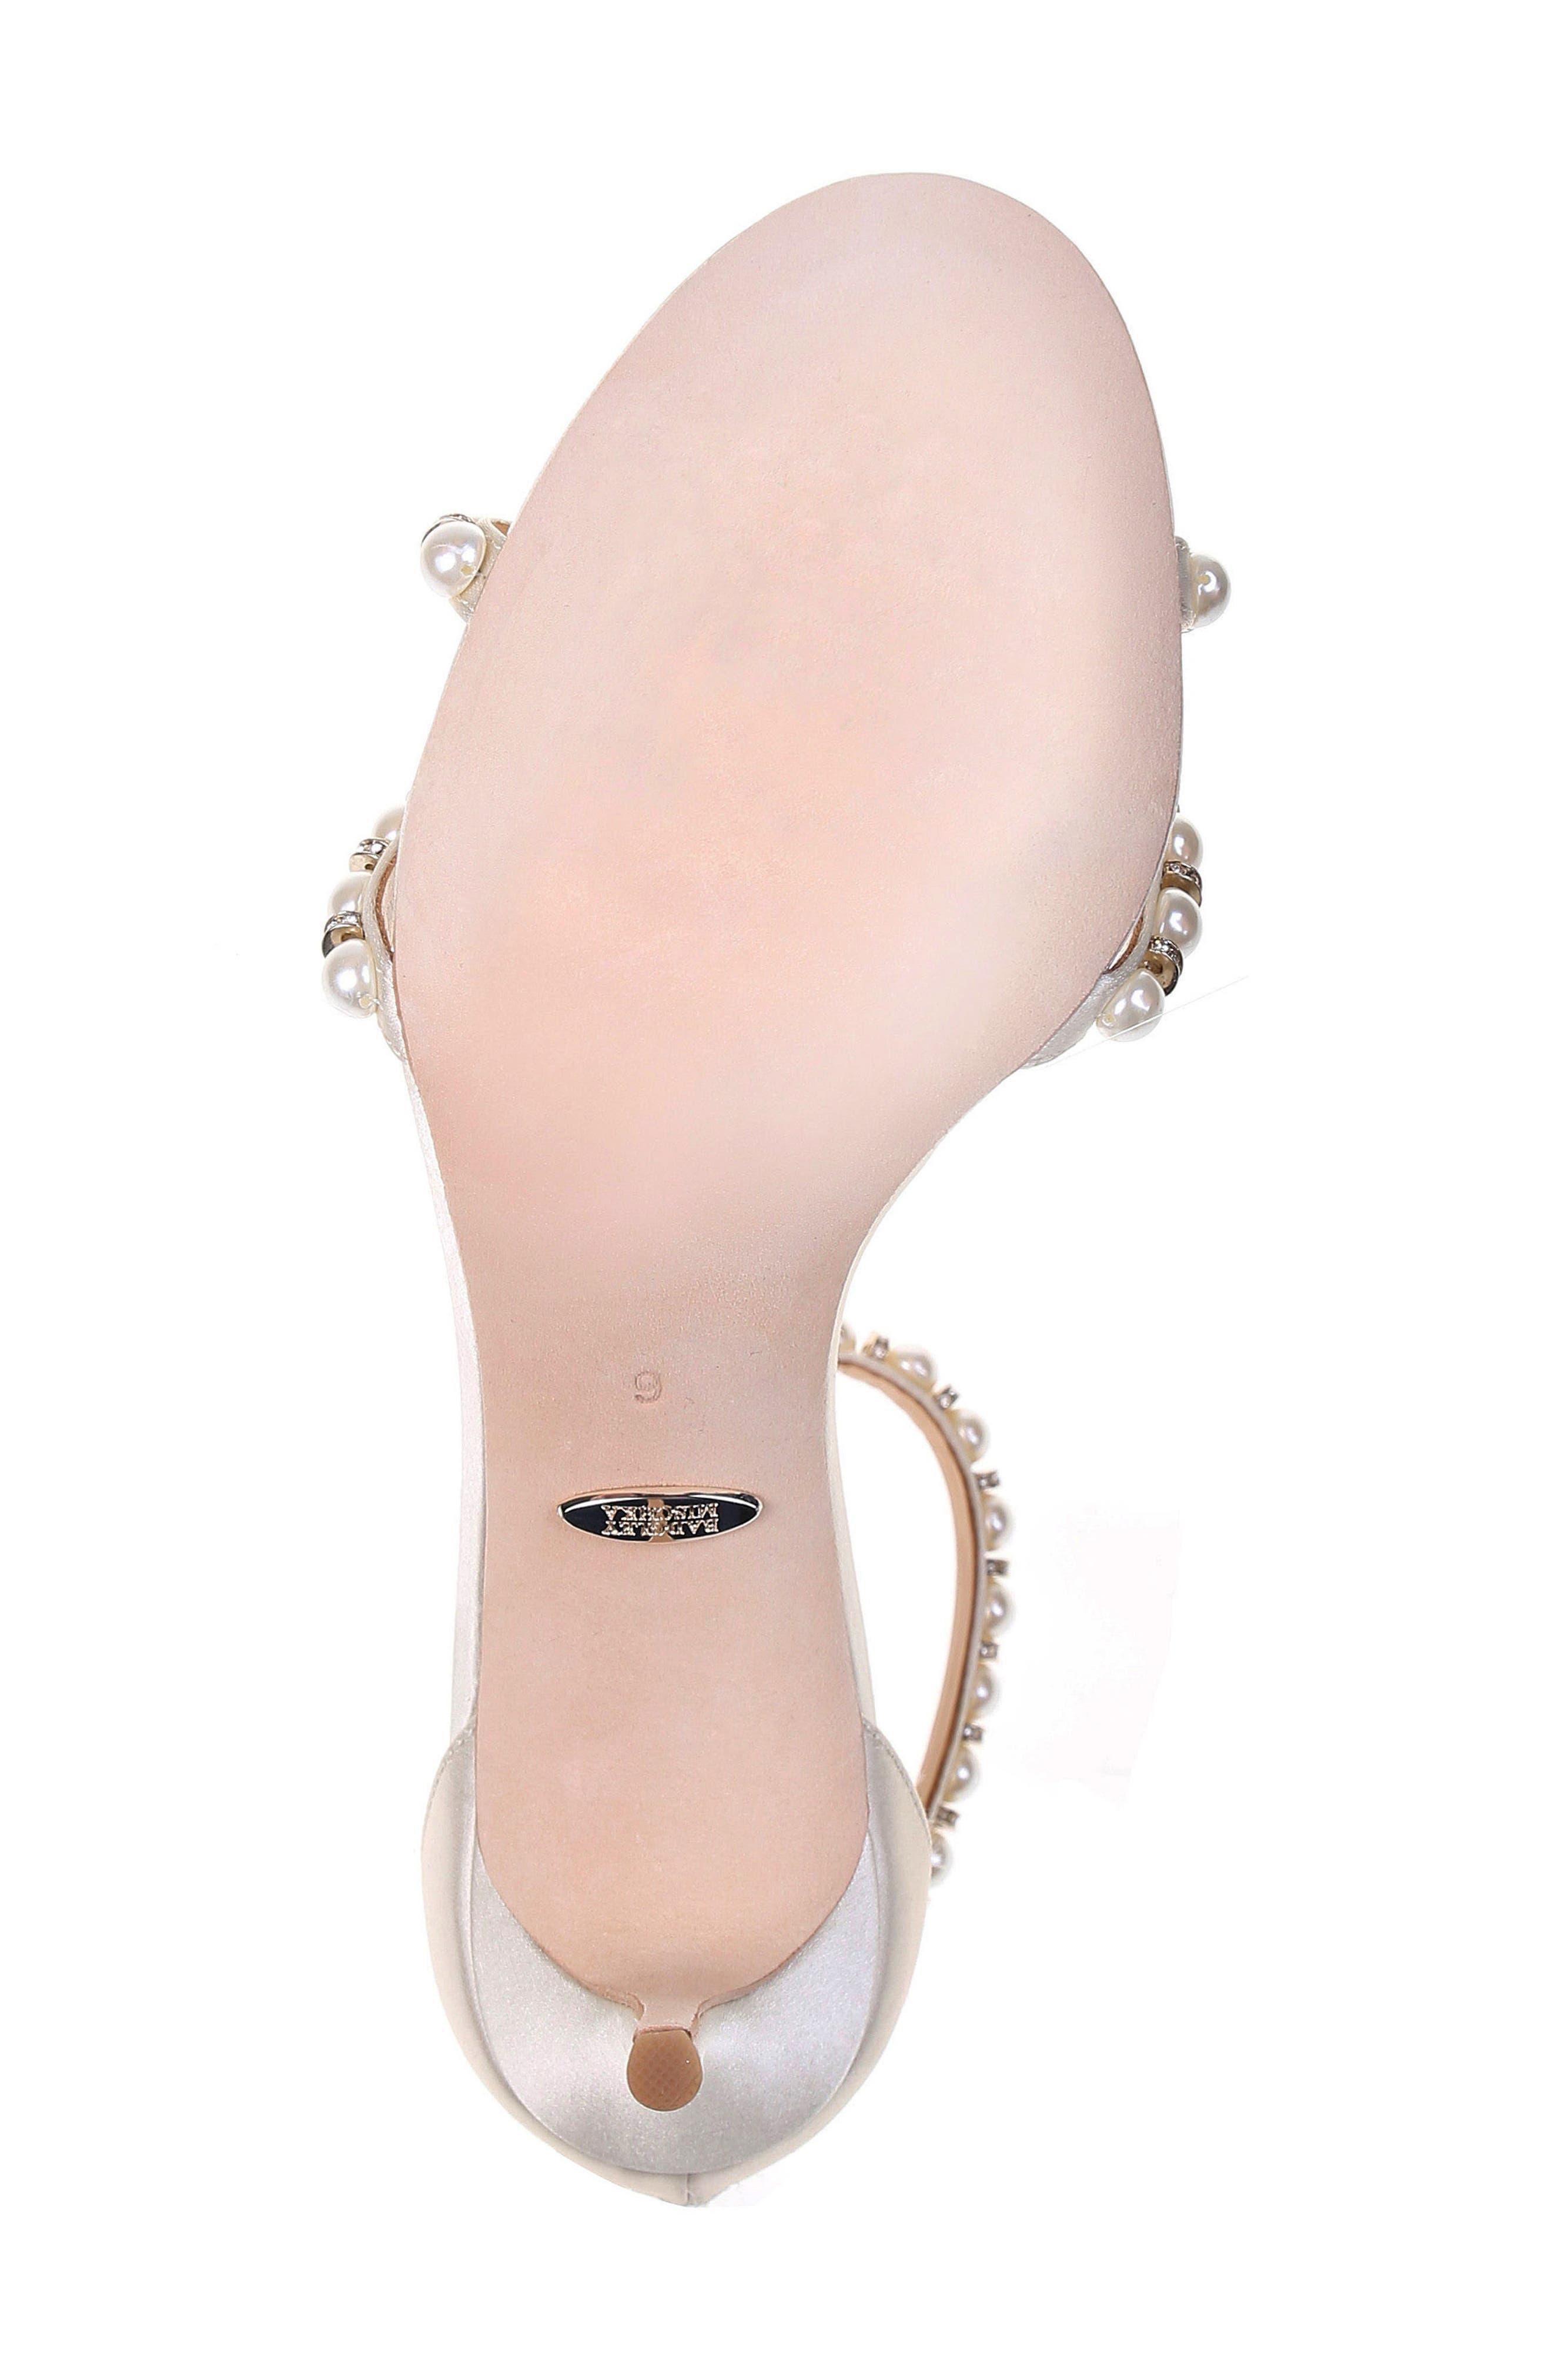 Hannah Embellished Ankle Strap Sandal,                             Alternate thumbnail 6, color,                             Ivory Satin